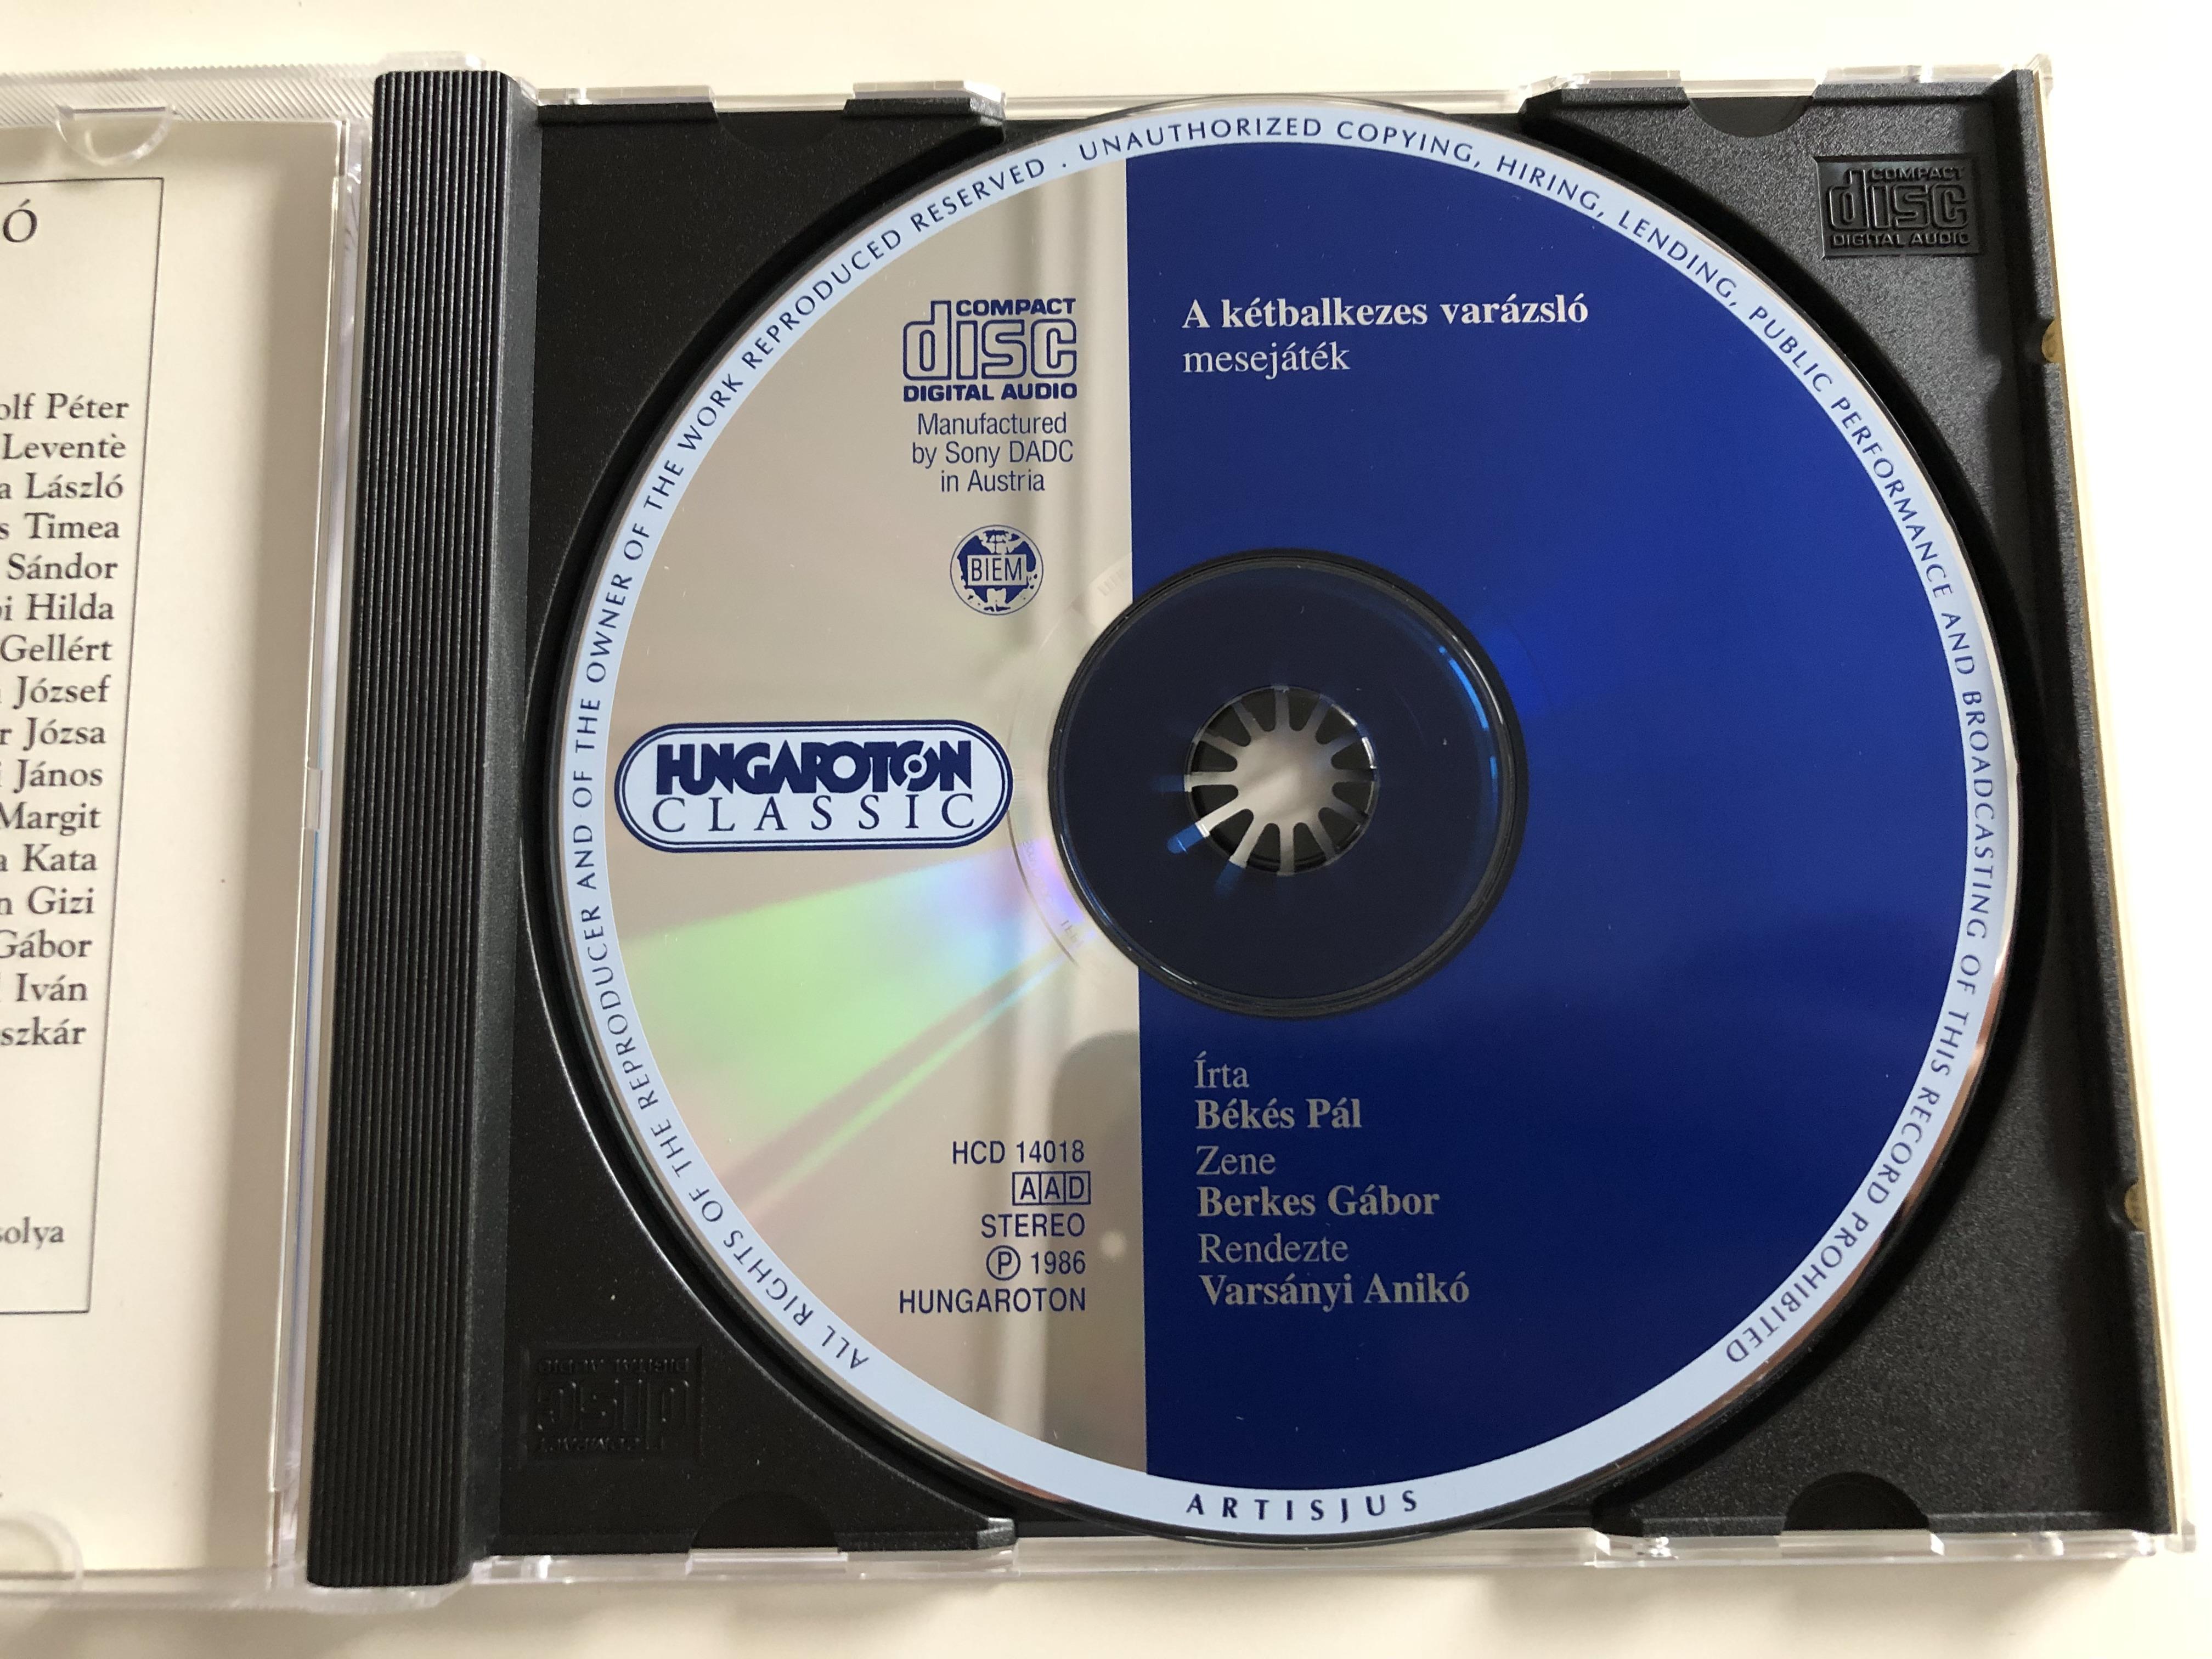 a-k-tbalkezes-var-zsl-b-k-s-p-l-mesej-t-ka-the-clumsy-magician-hungarian-radioplay-for-children-music-by-berkes-g-bor-hungaroton-classic-audio-cd-2003-hcd-14018-3-.jpg